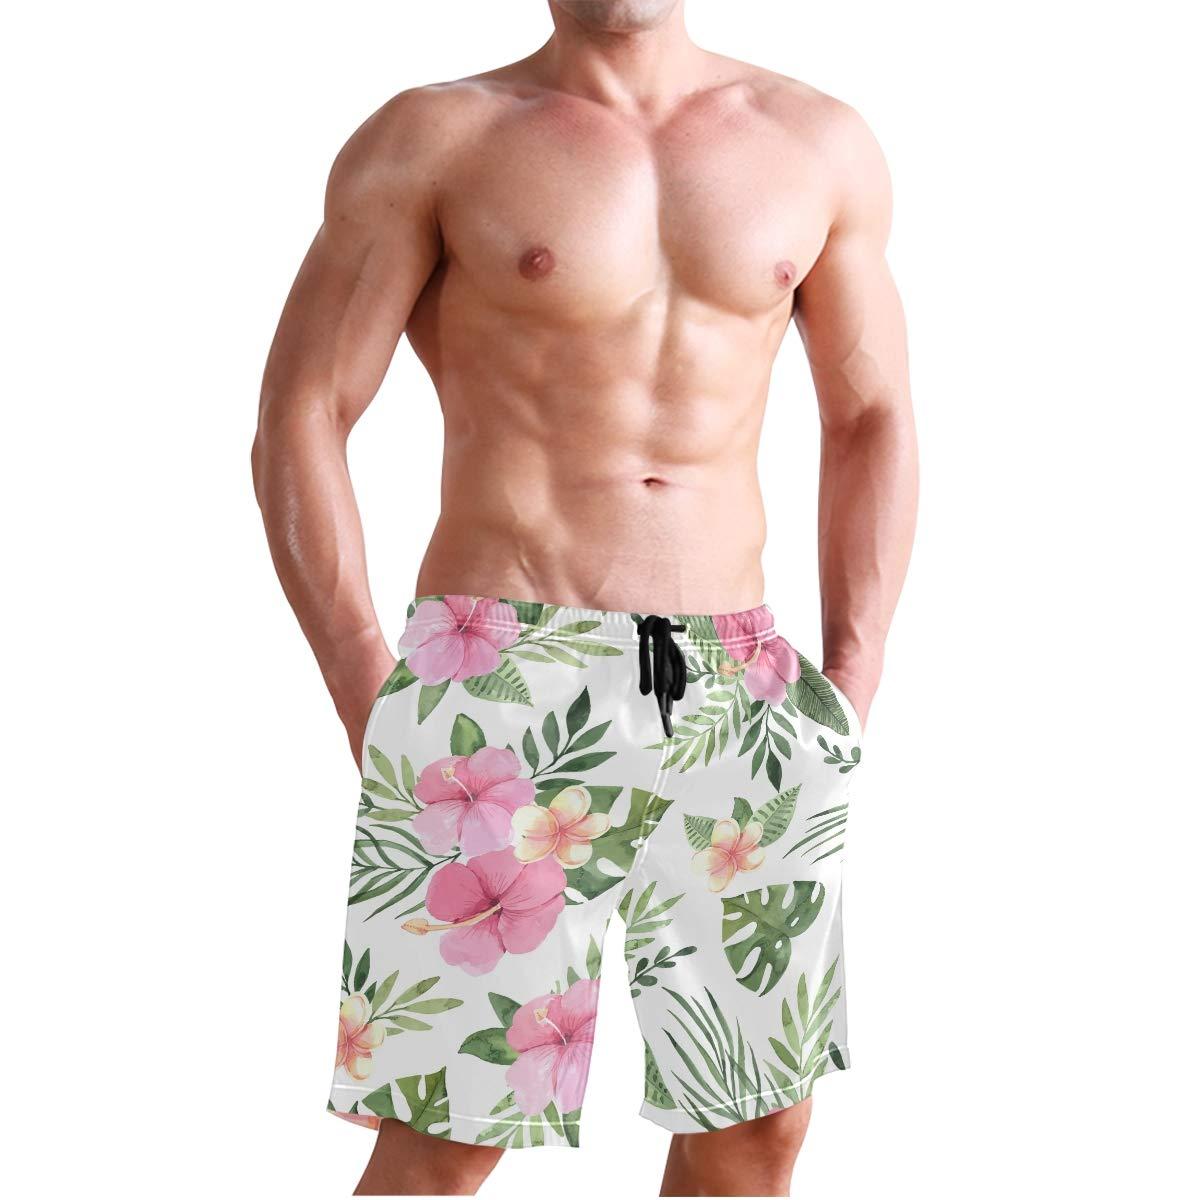 Josid Mens Summer Swim Trunks Quick Dry Beach Board Shorts Mesh Lining,Palm Tree Leaves